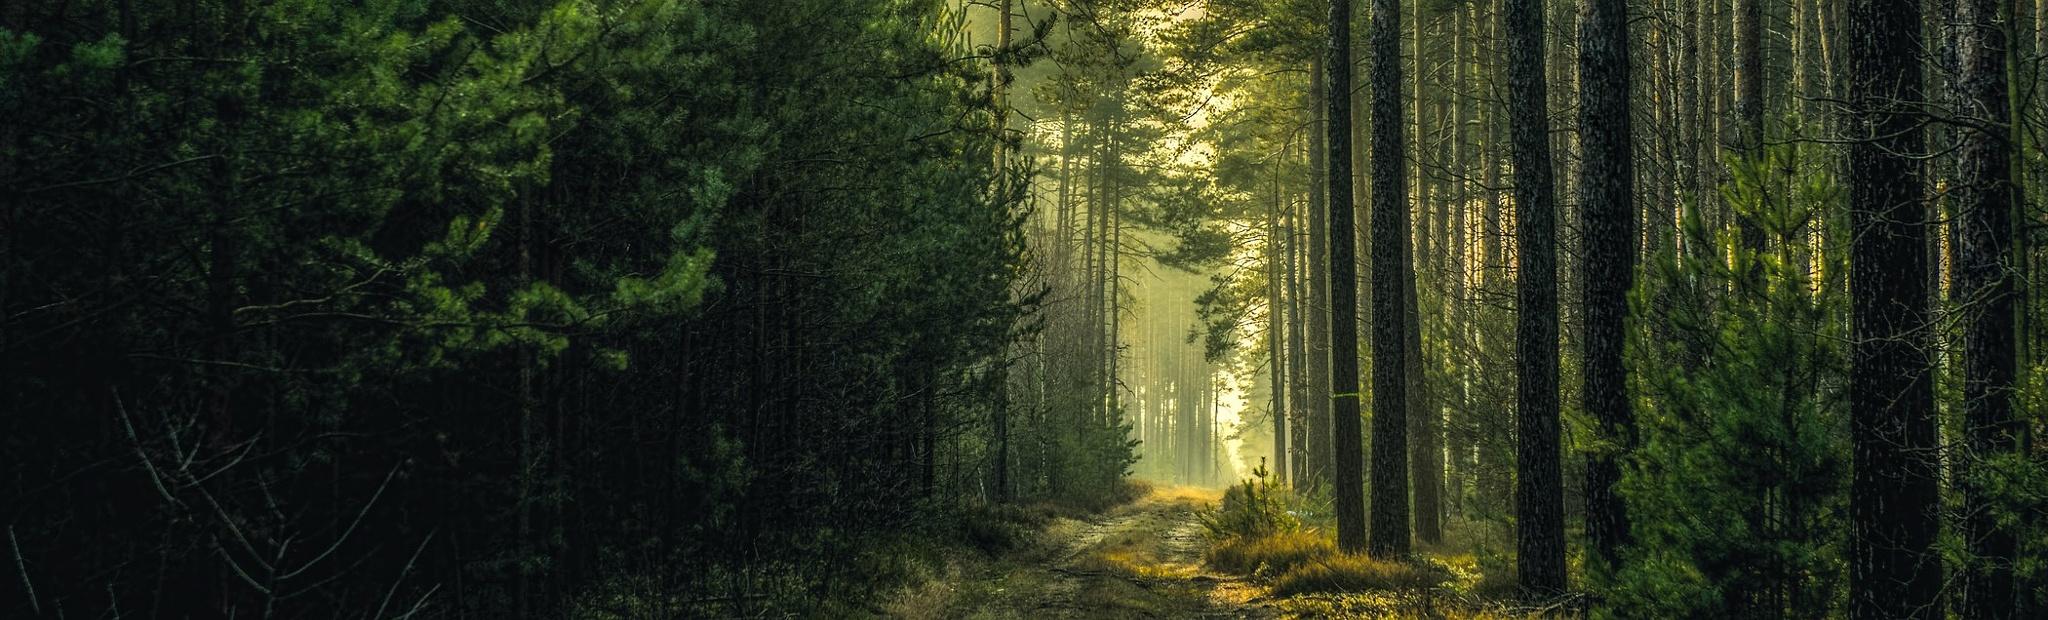 Light and forest by Waldemar Sadlowski